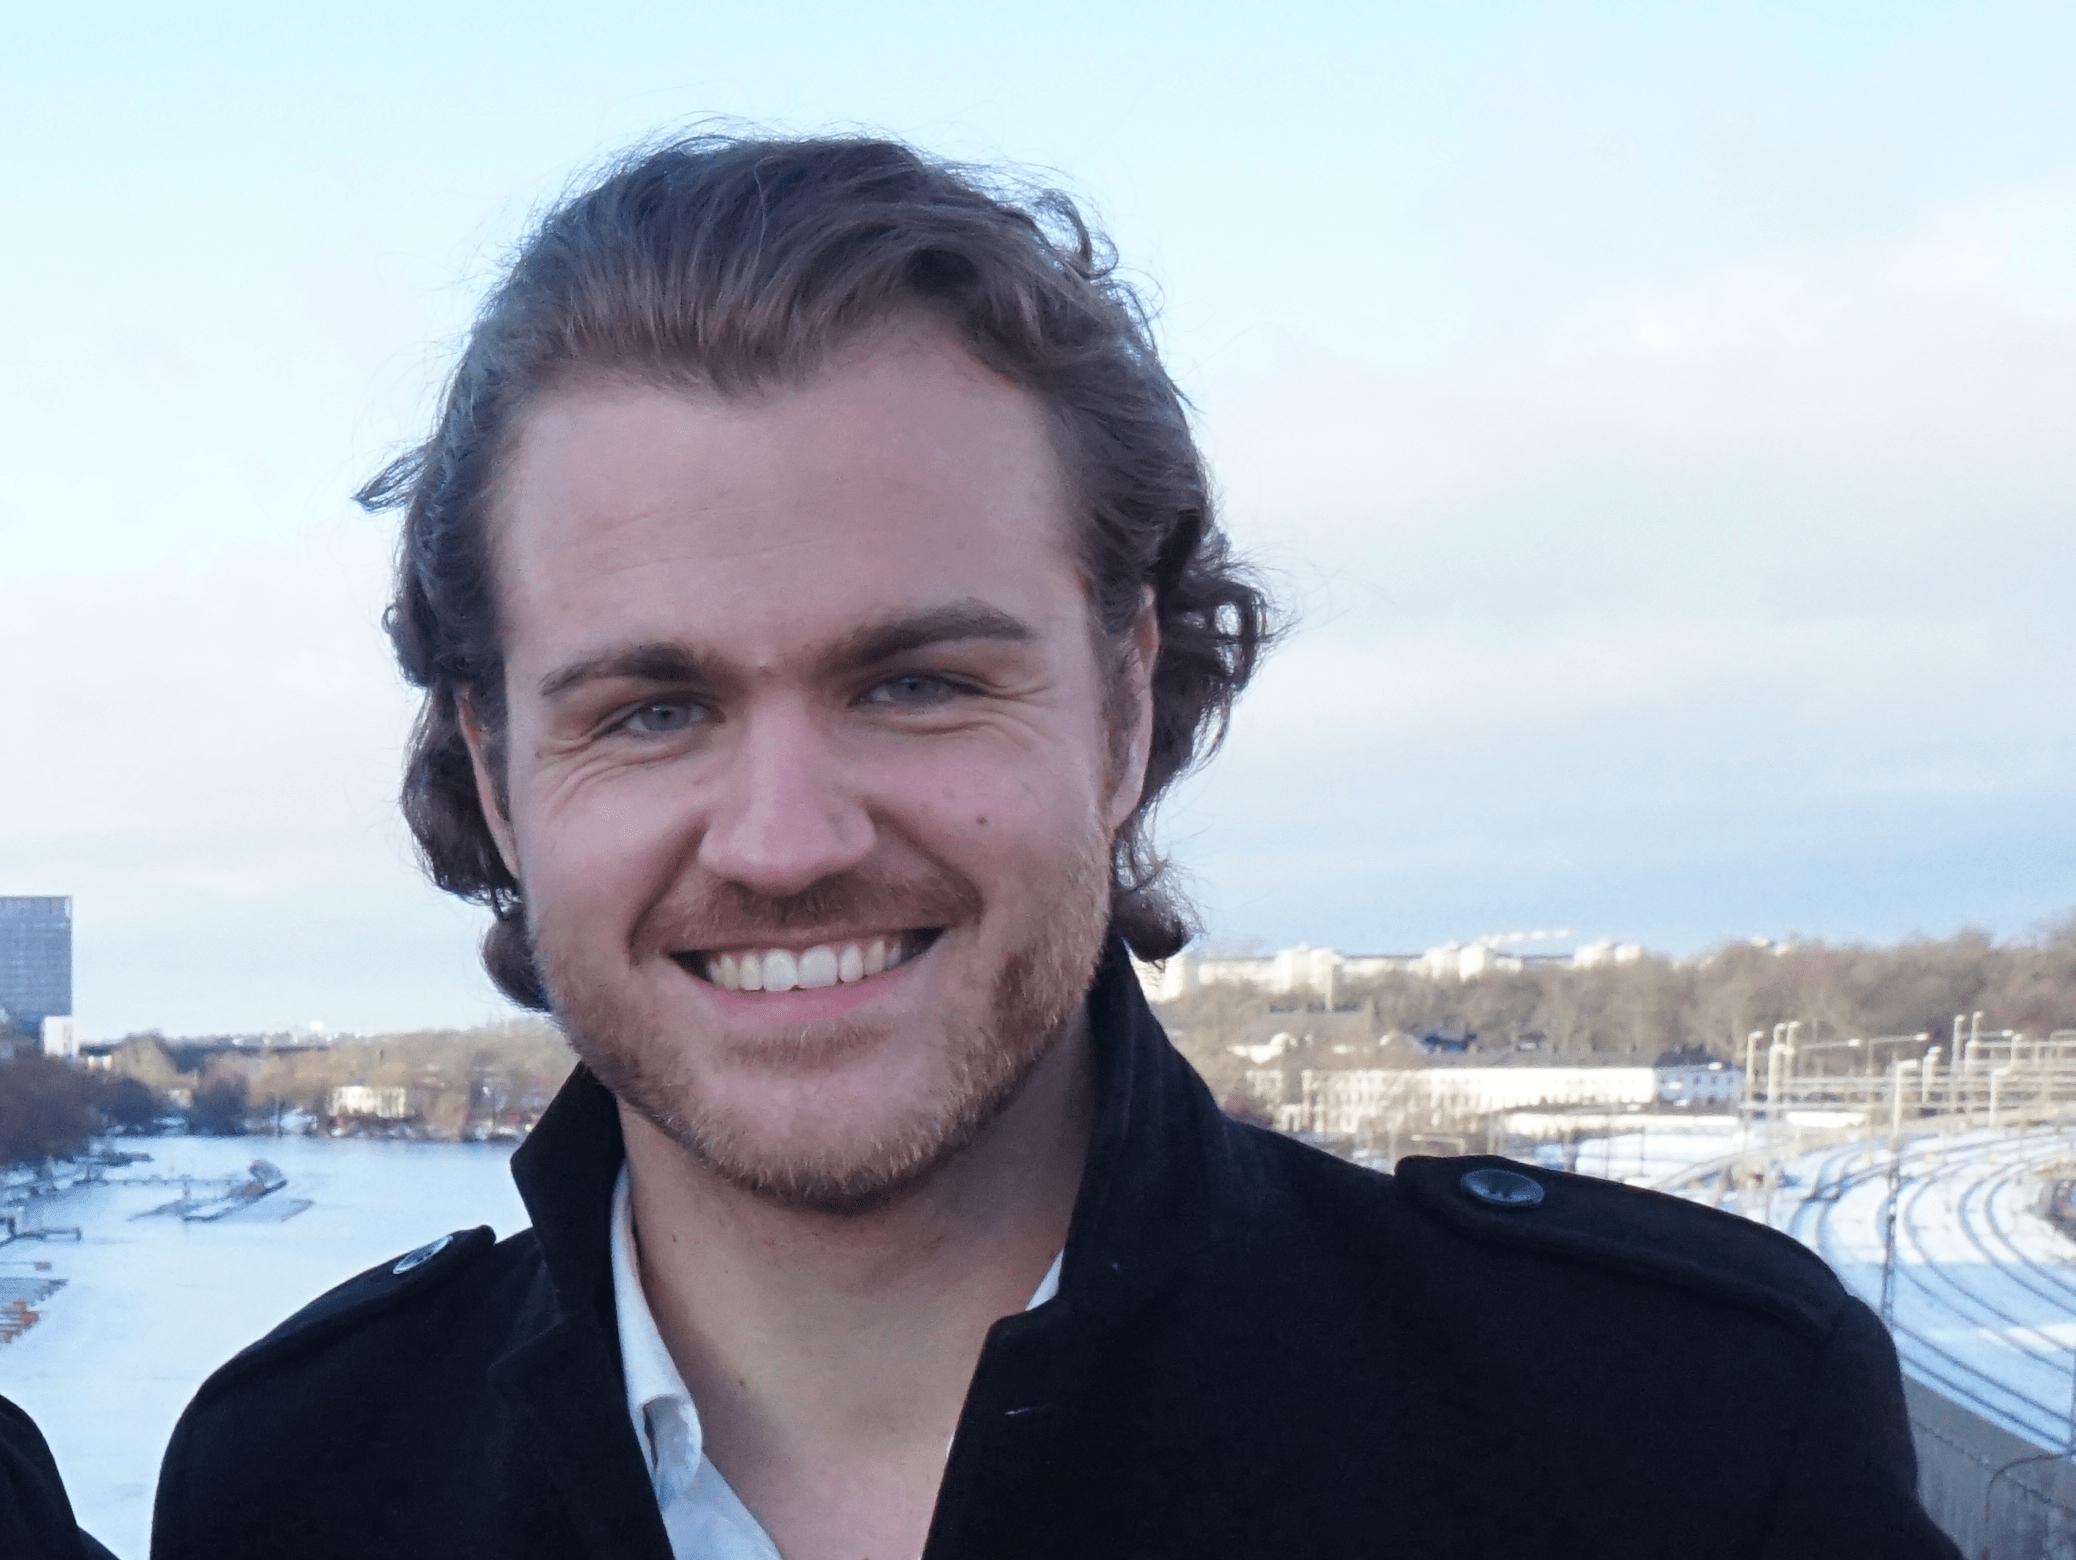 Christoph Skrobol Talente Massnahmen Onboarding neuer Mitarbeiter